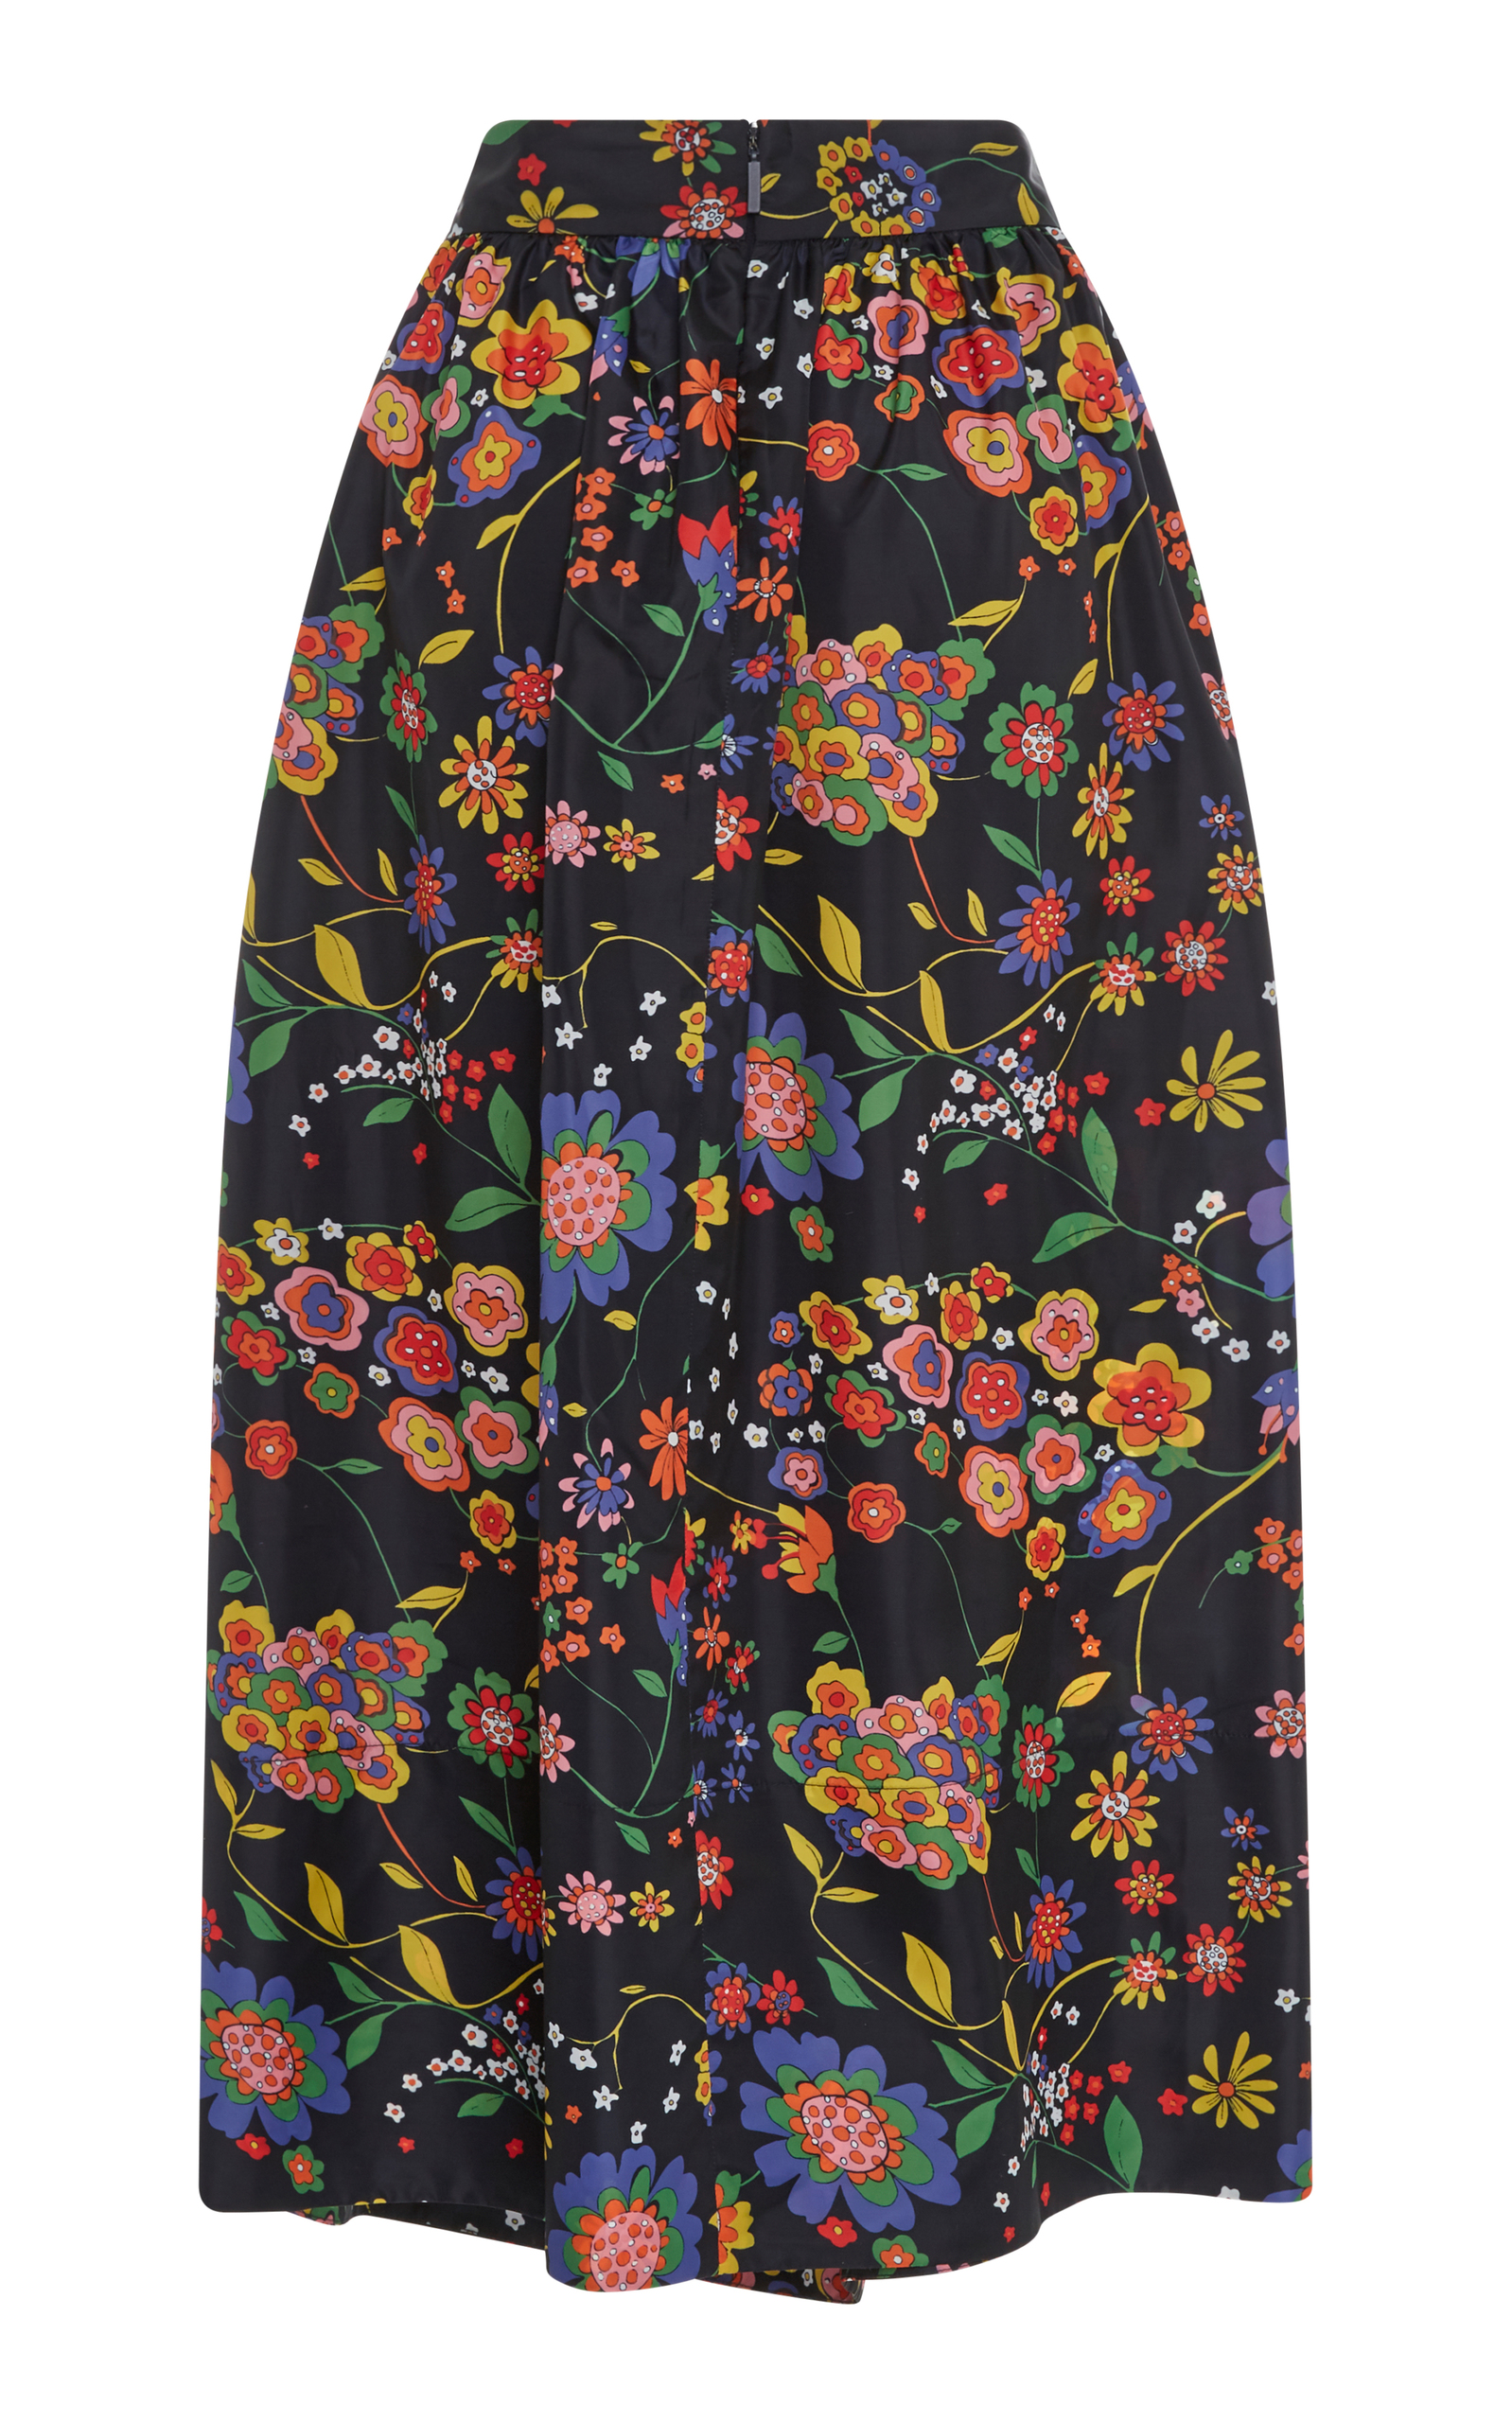 9a317f9981 TibiSmocking Floral Full Skirt. CLOSE. Loading. Loading